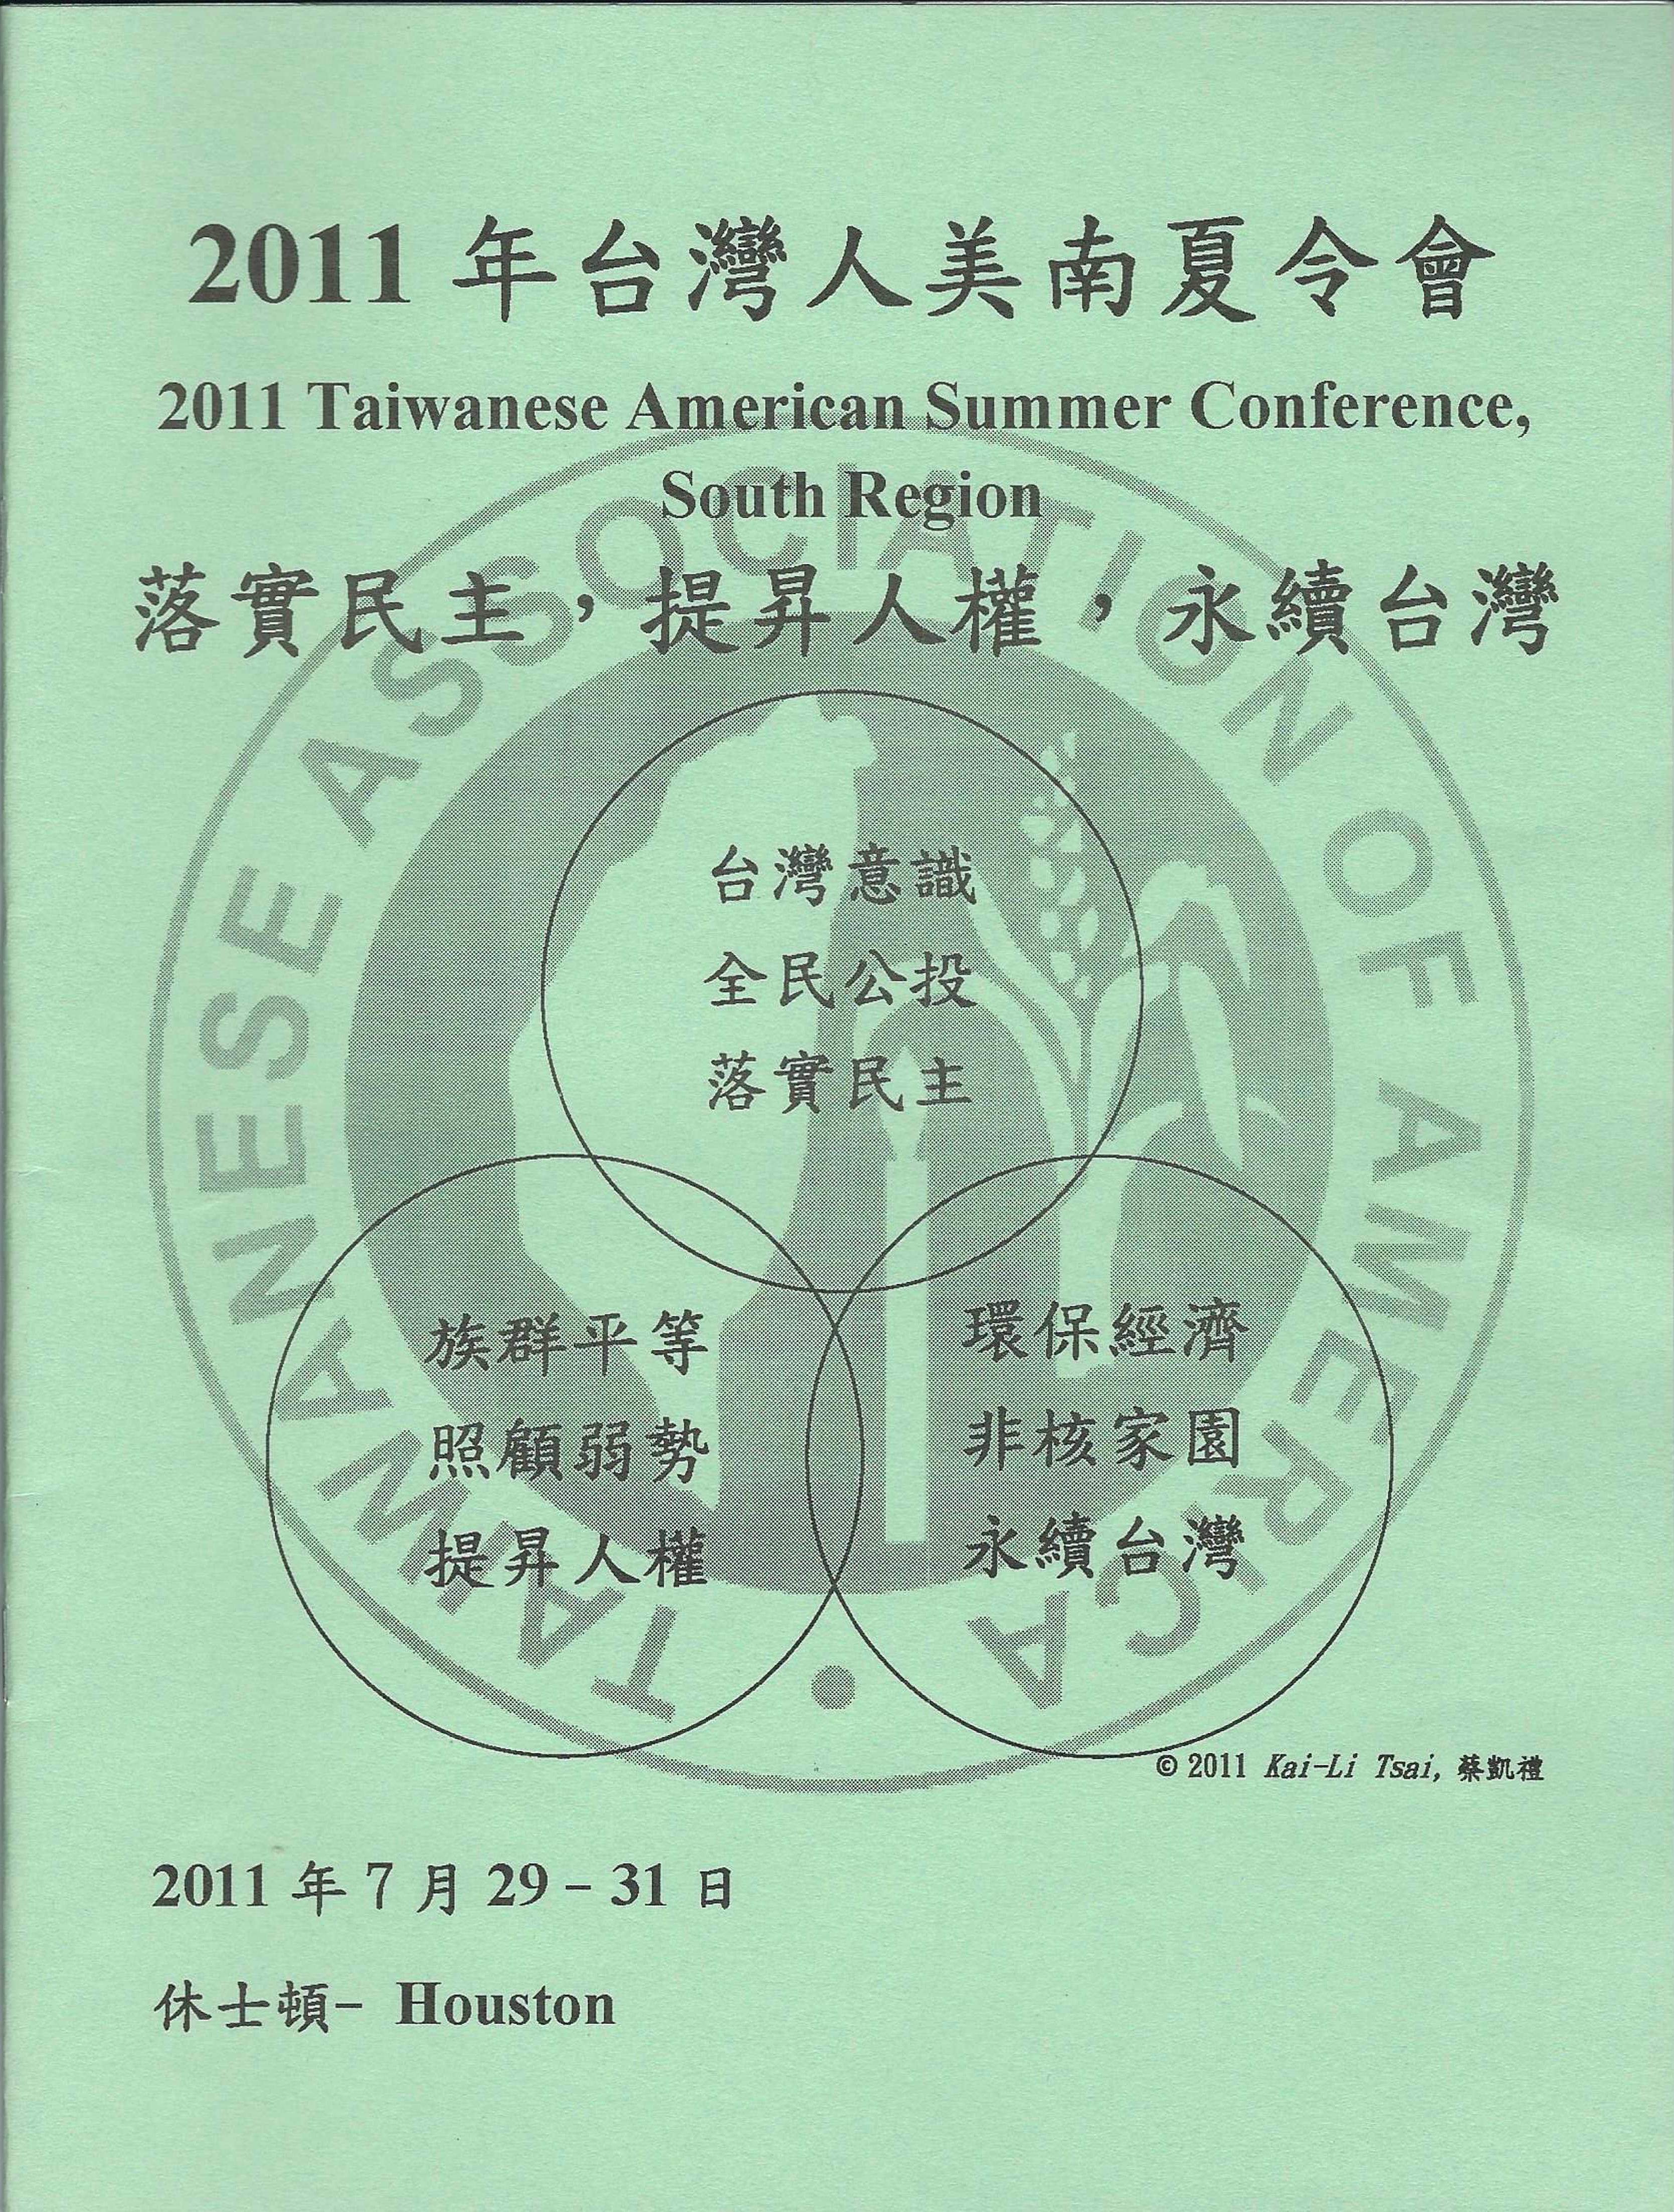 TACSR 2011